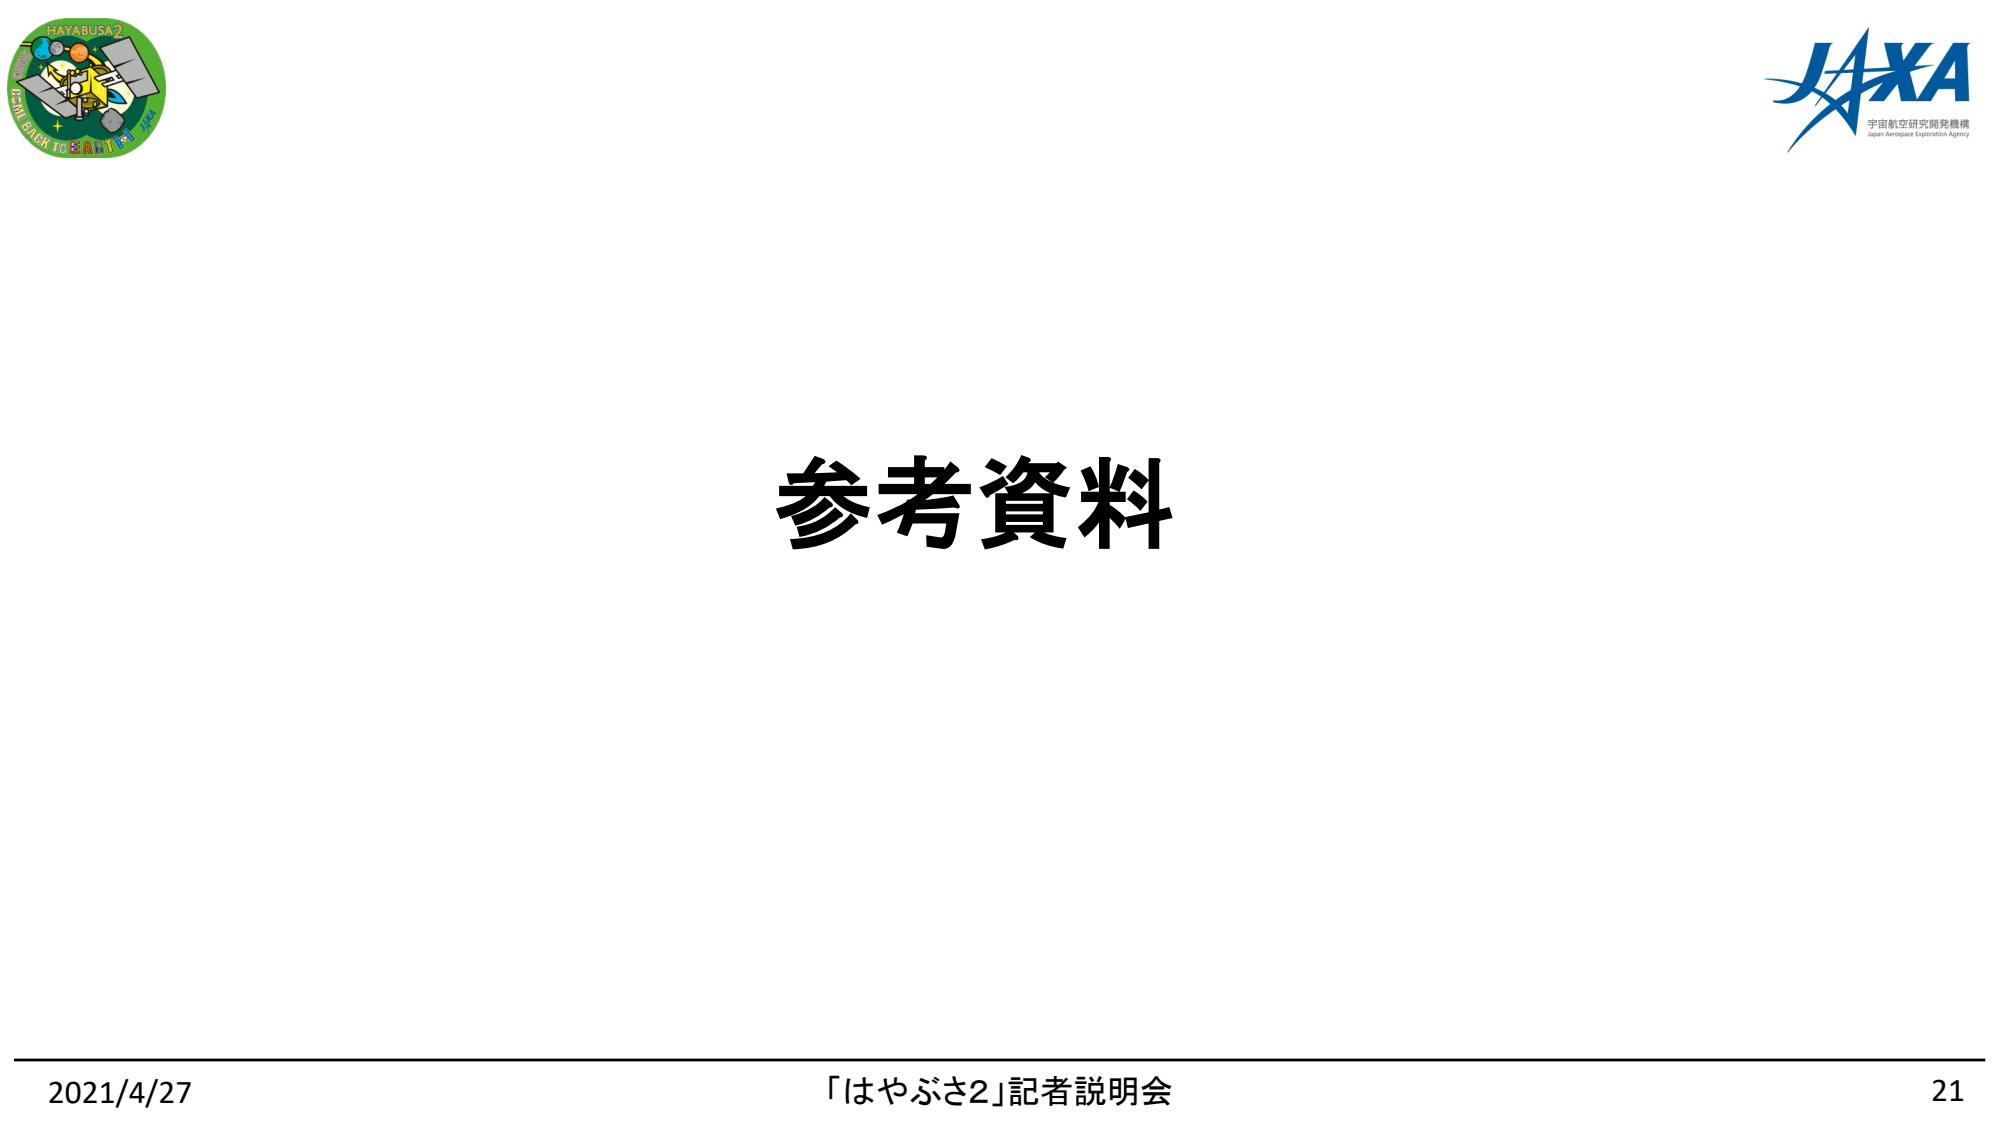 f:id:Imamura:20210427135313p:plain